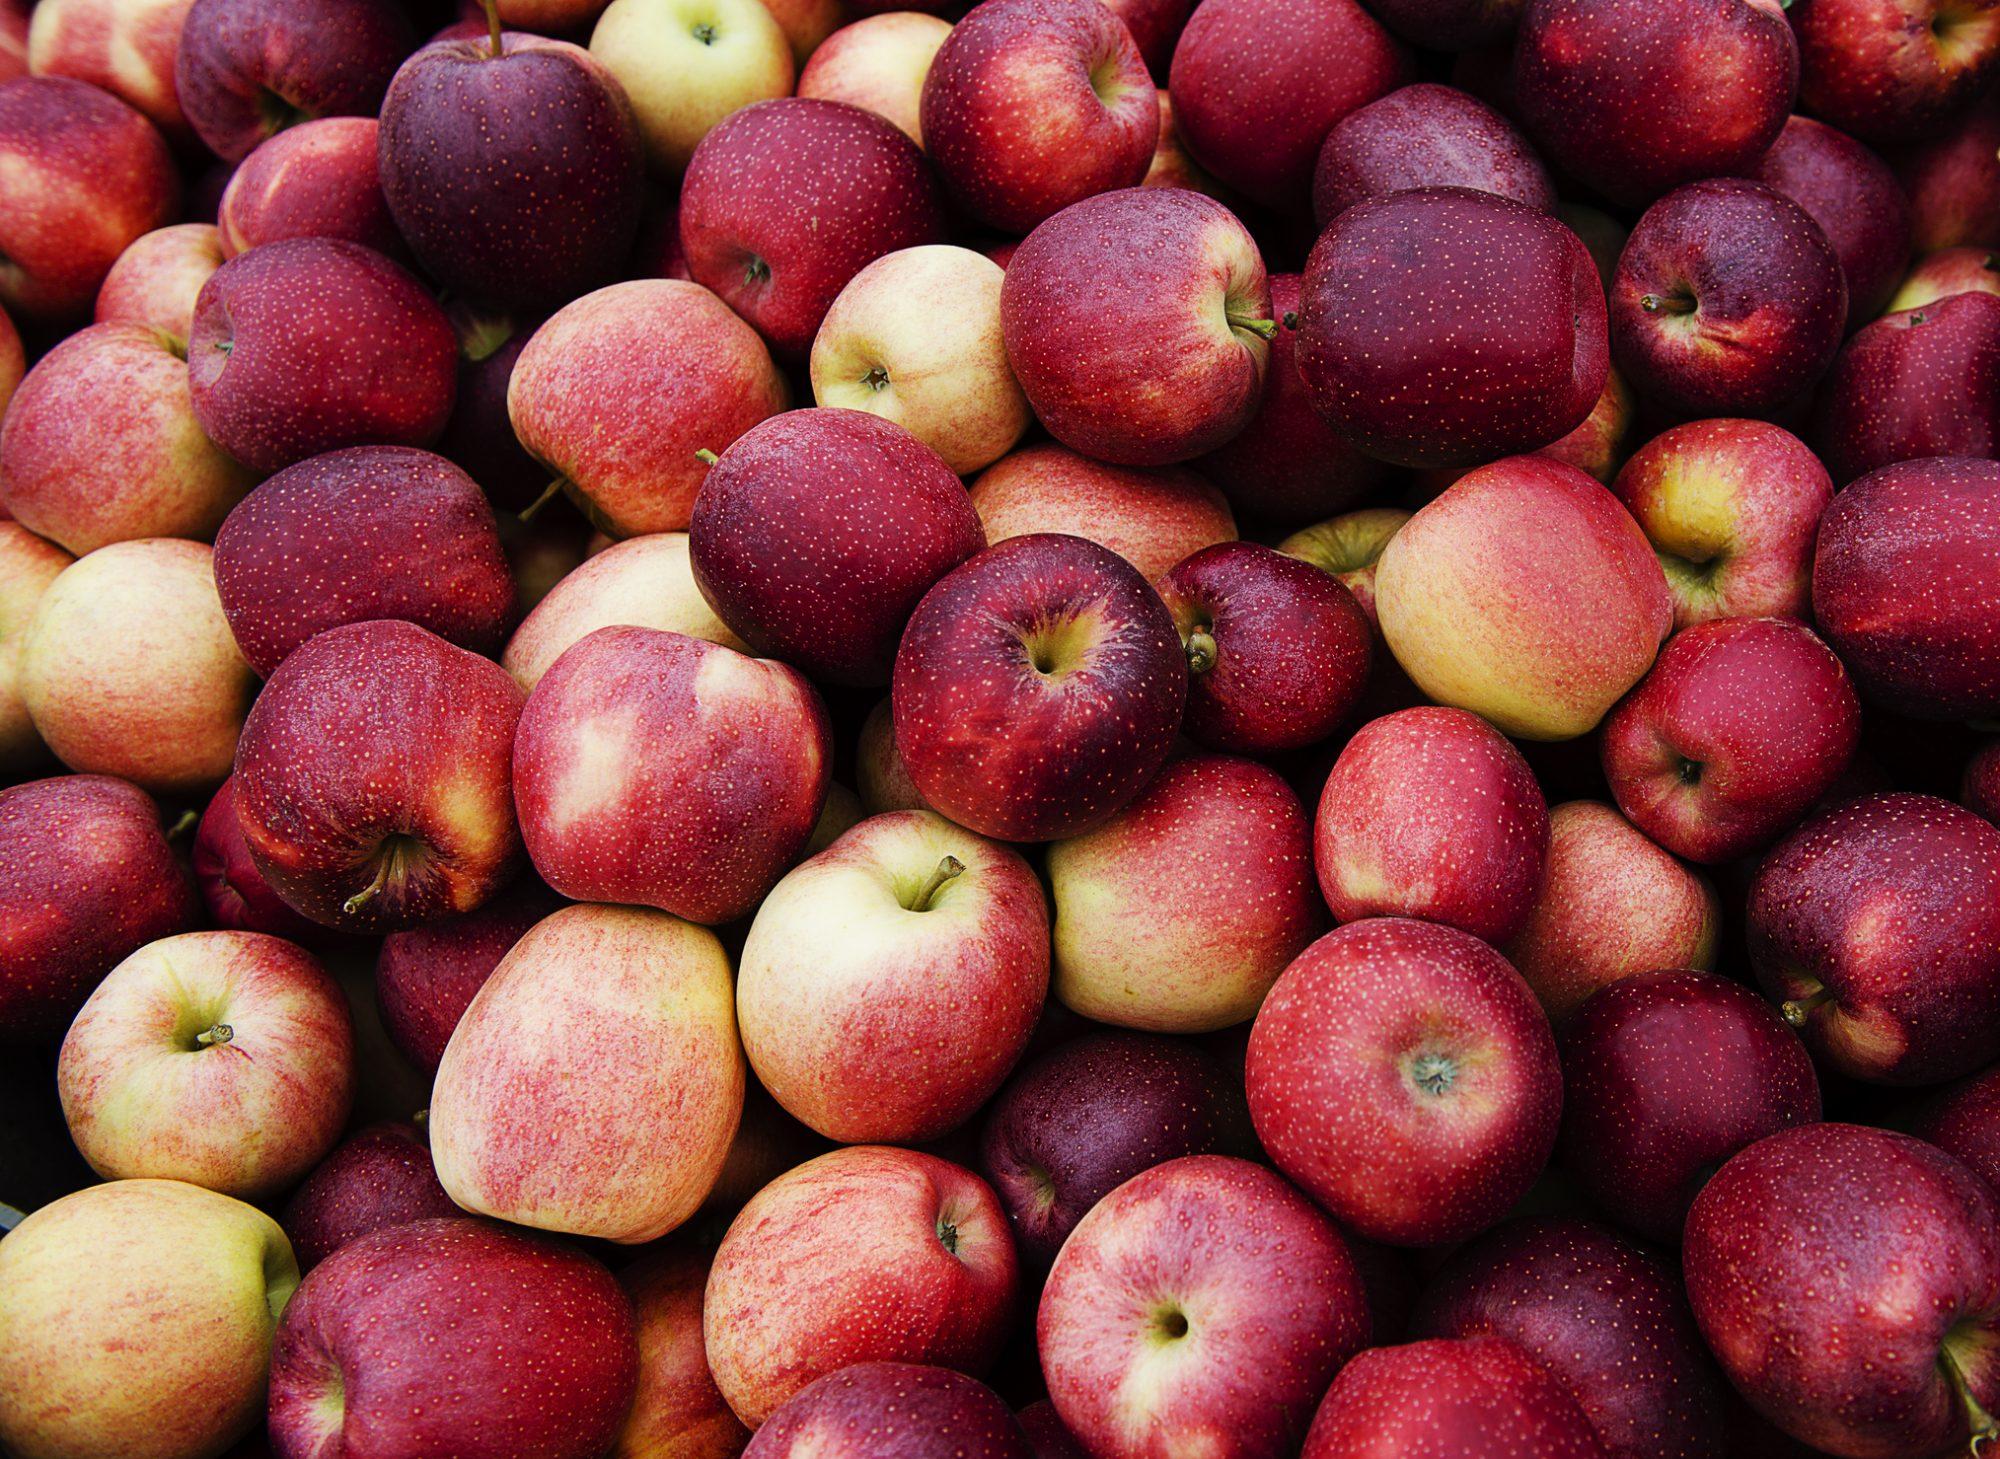 Macintosh apples for sale